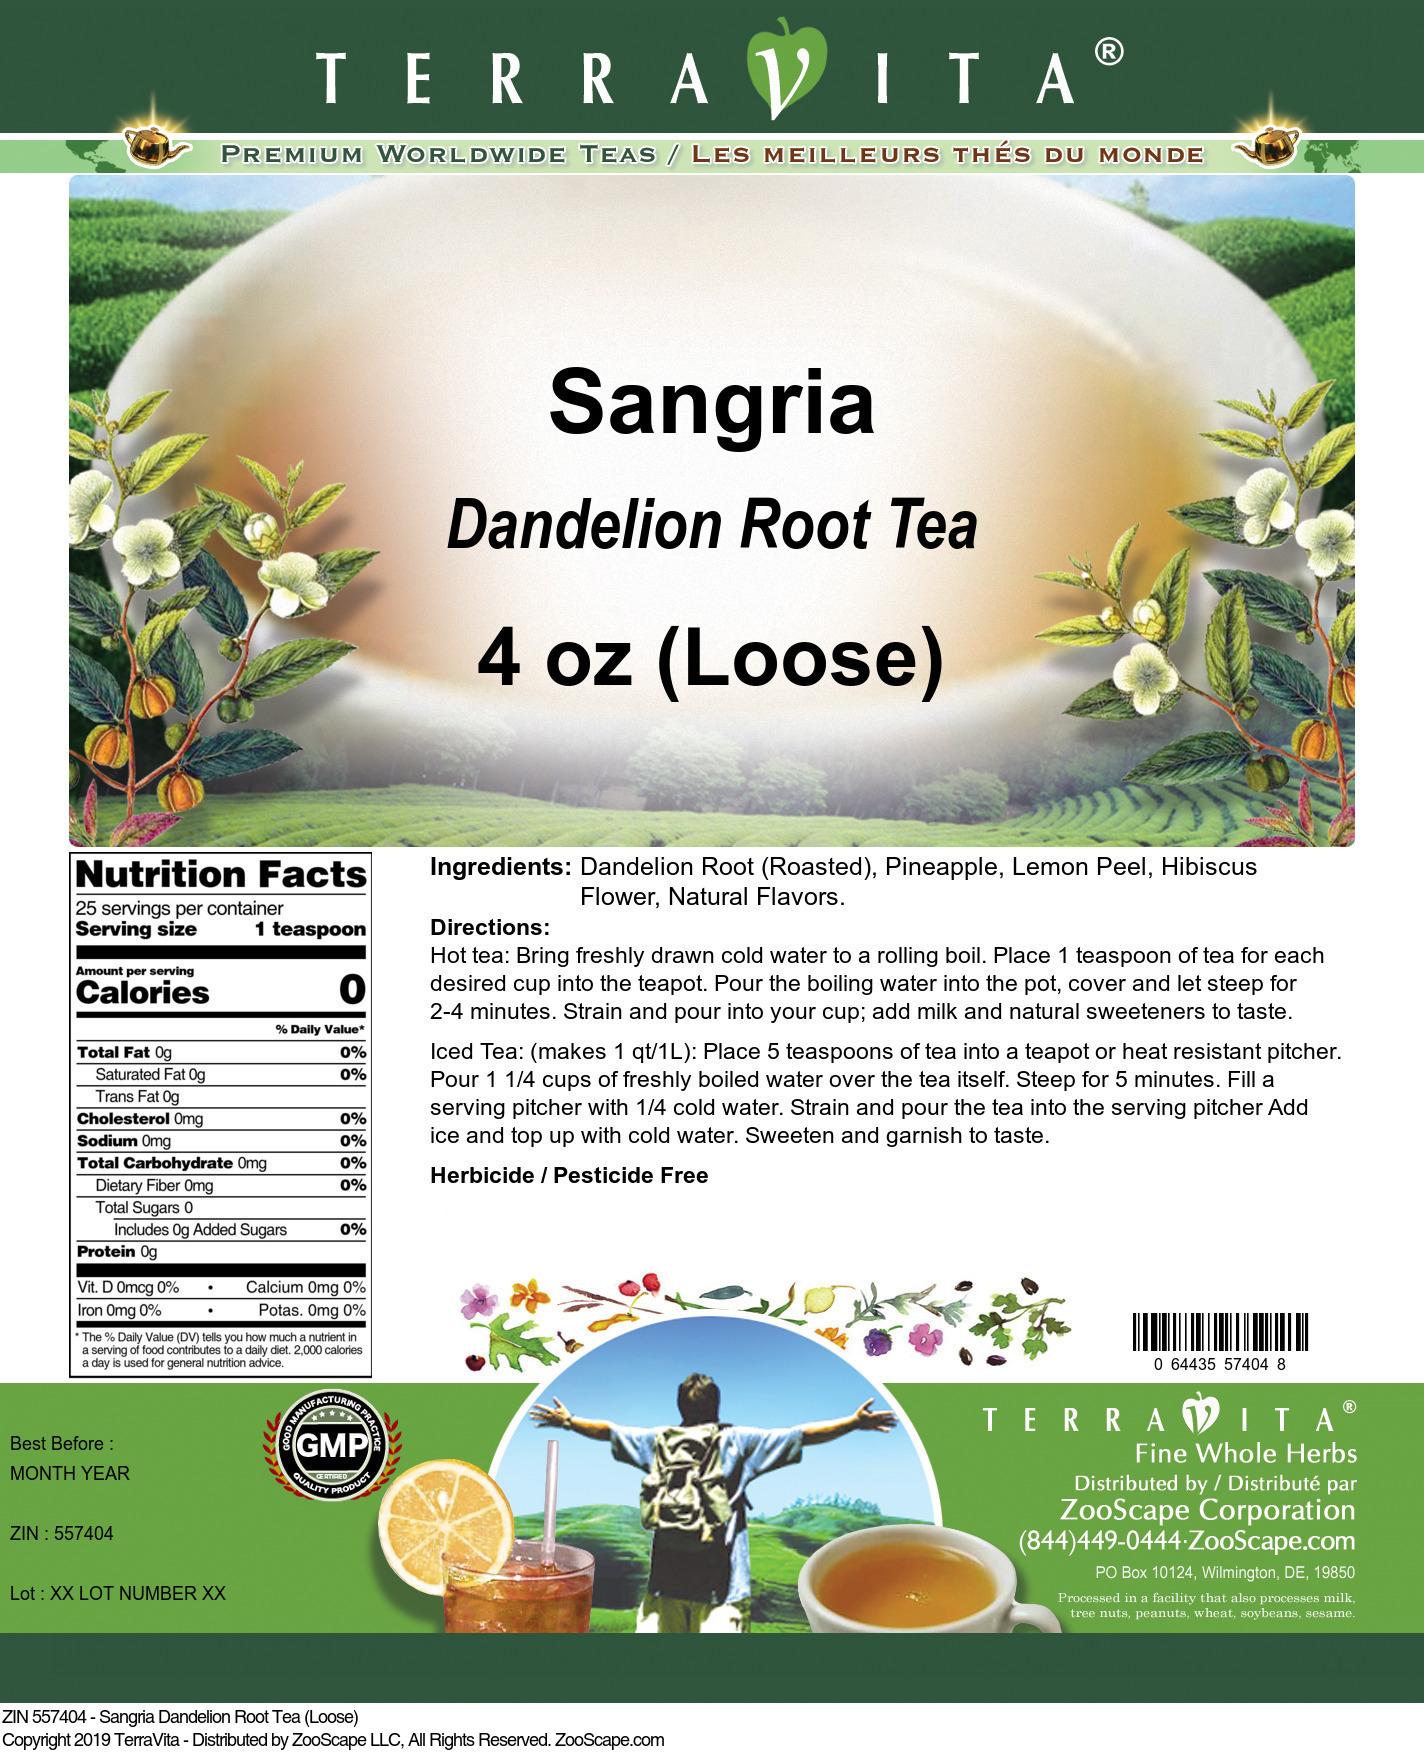 Sangria Dandelion Root